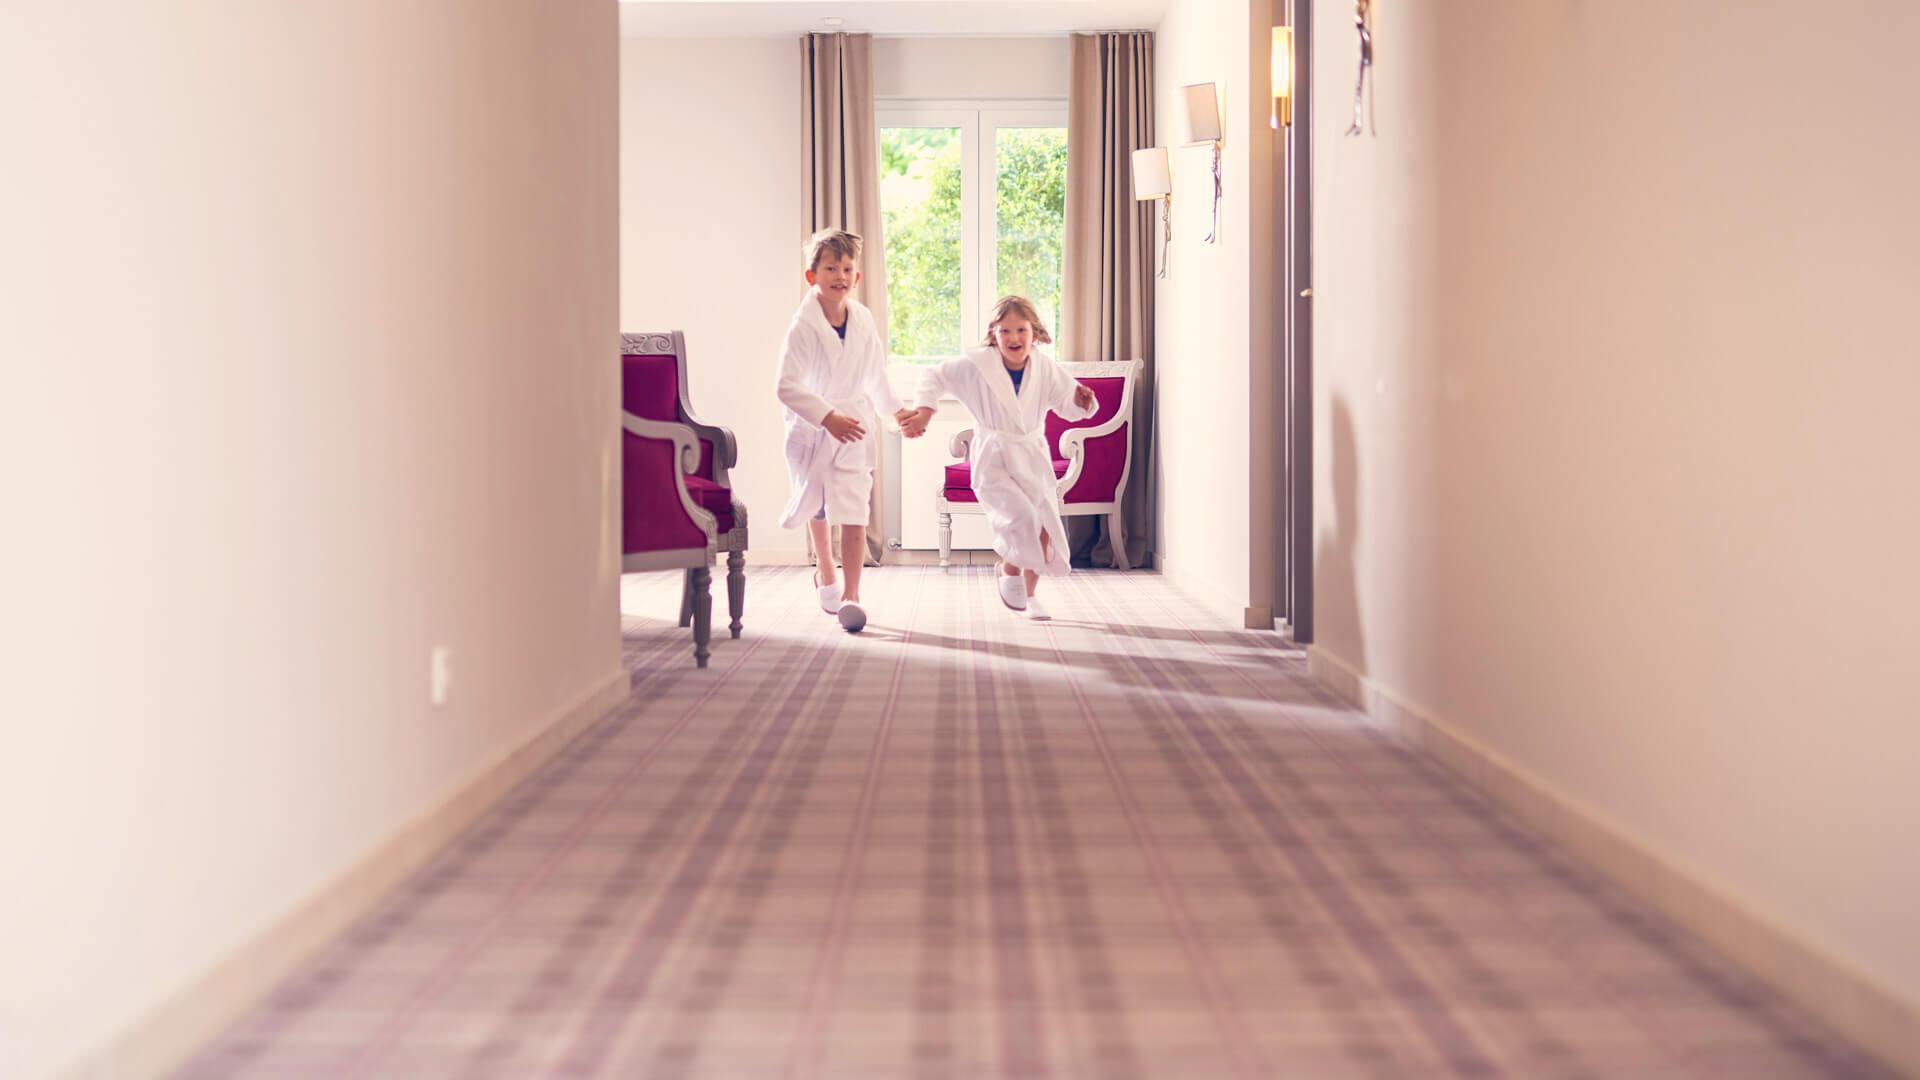 Hotelurlaub mit Kindern im Hotel VILA VITA Rosenpark